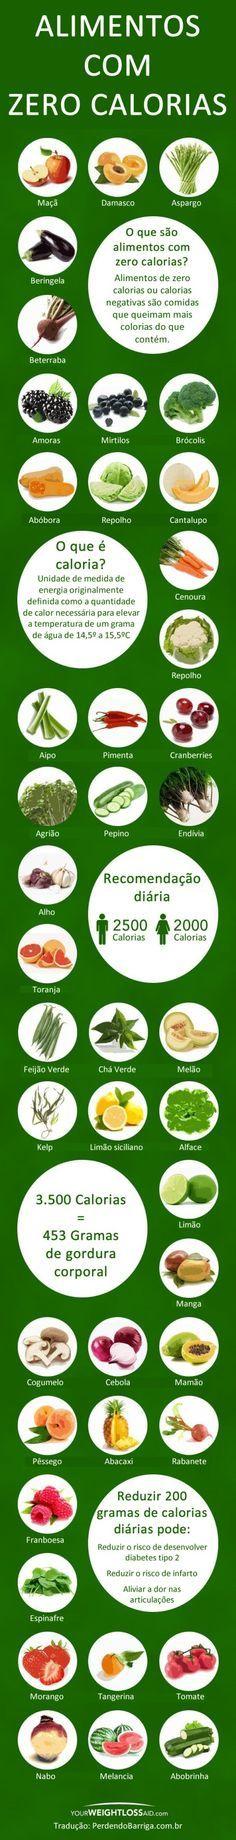 Alimentos zero calorias